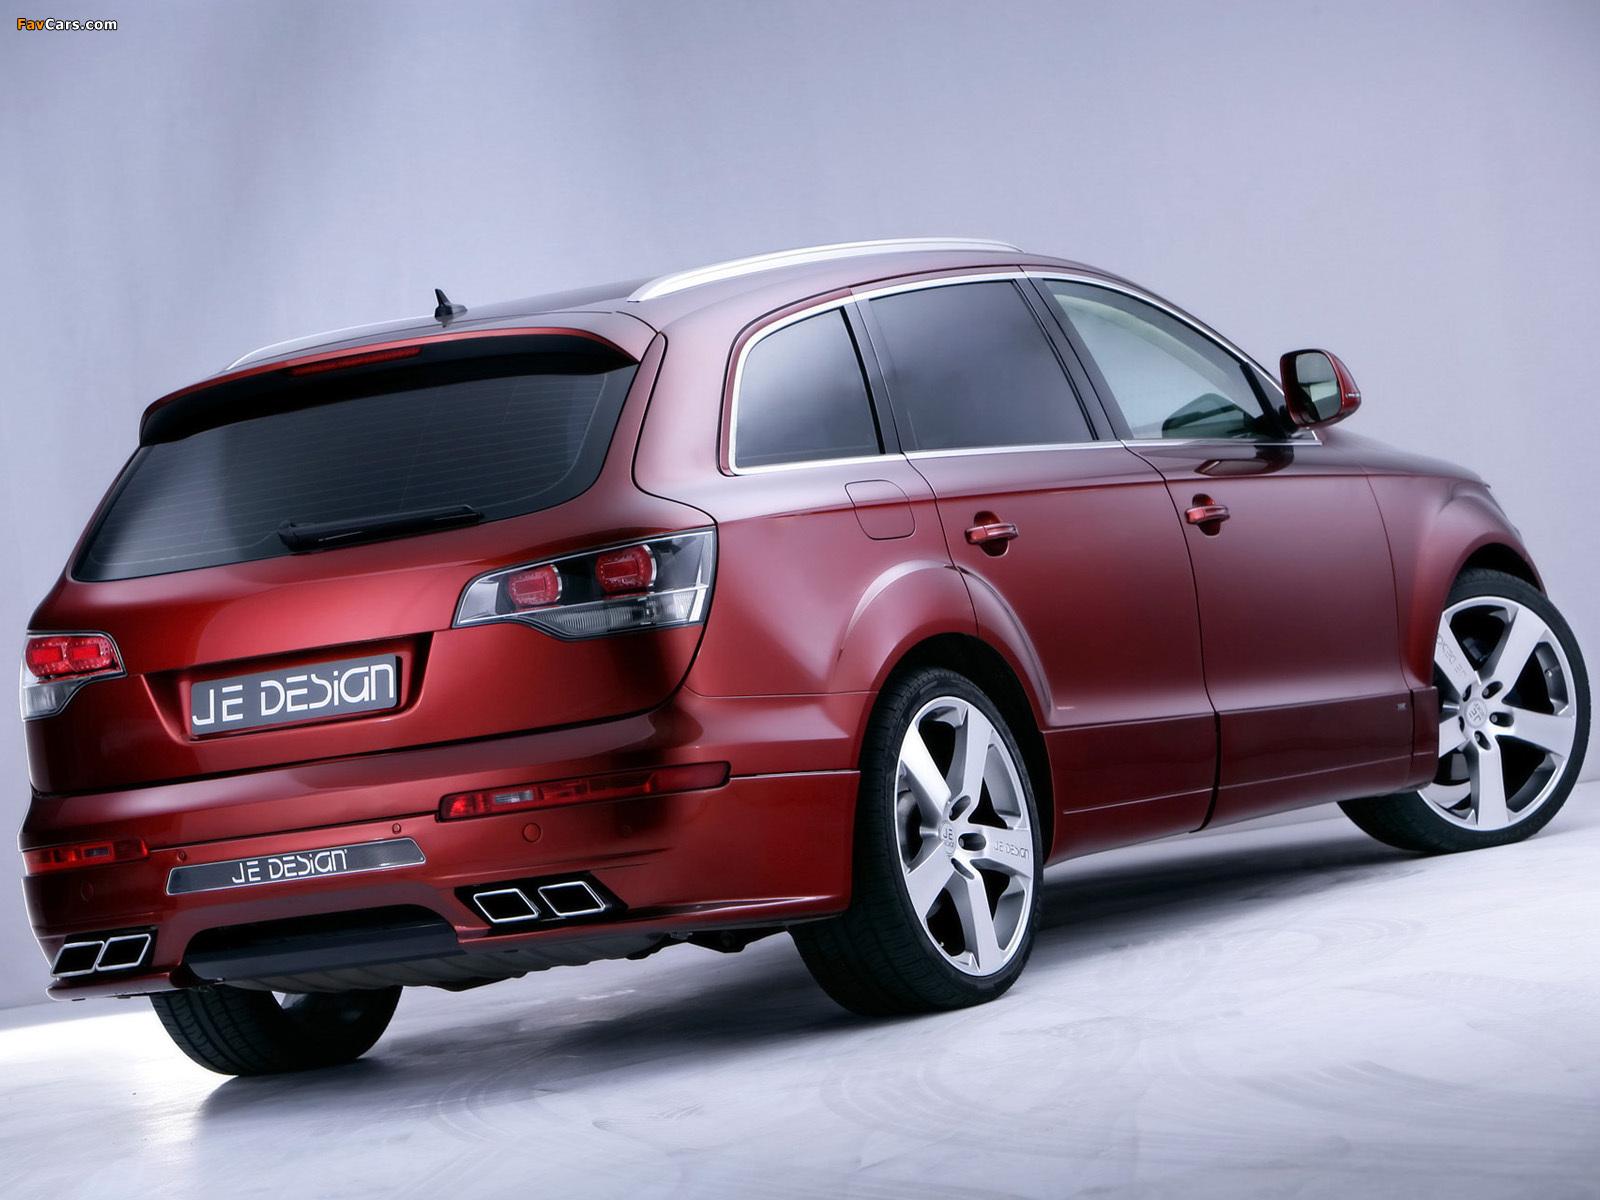 Je Design Audi Q7 Street Rocket 2007 pictures (1600 x 1200)